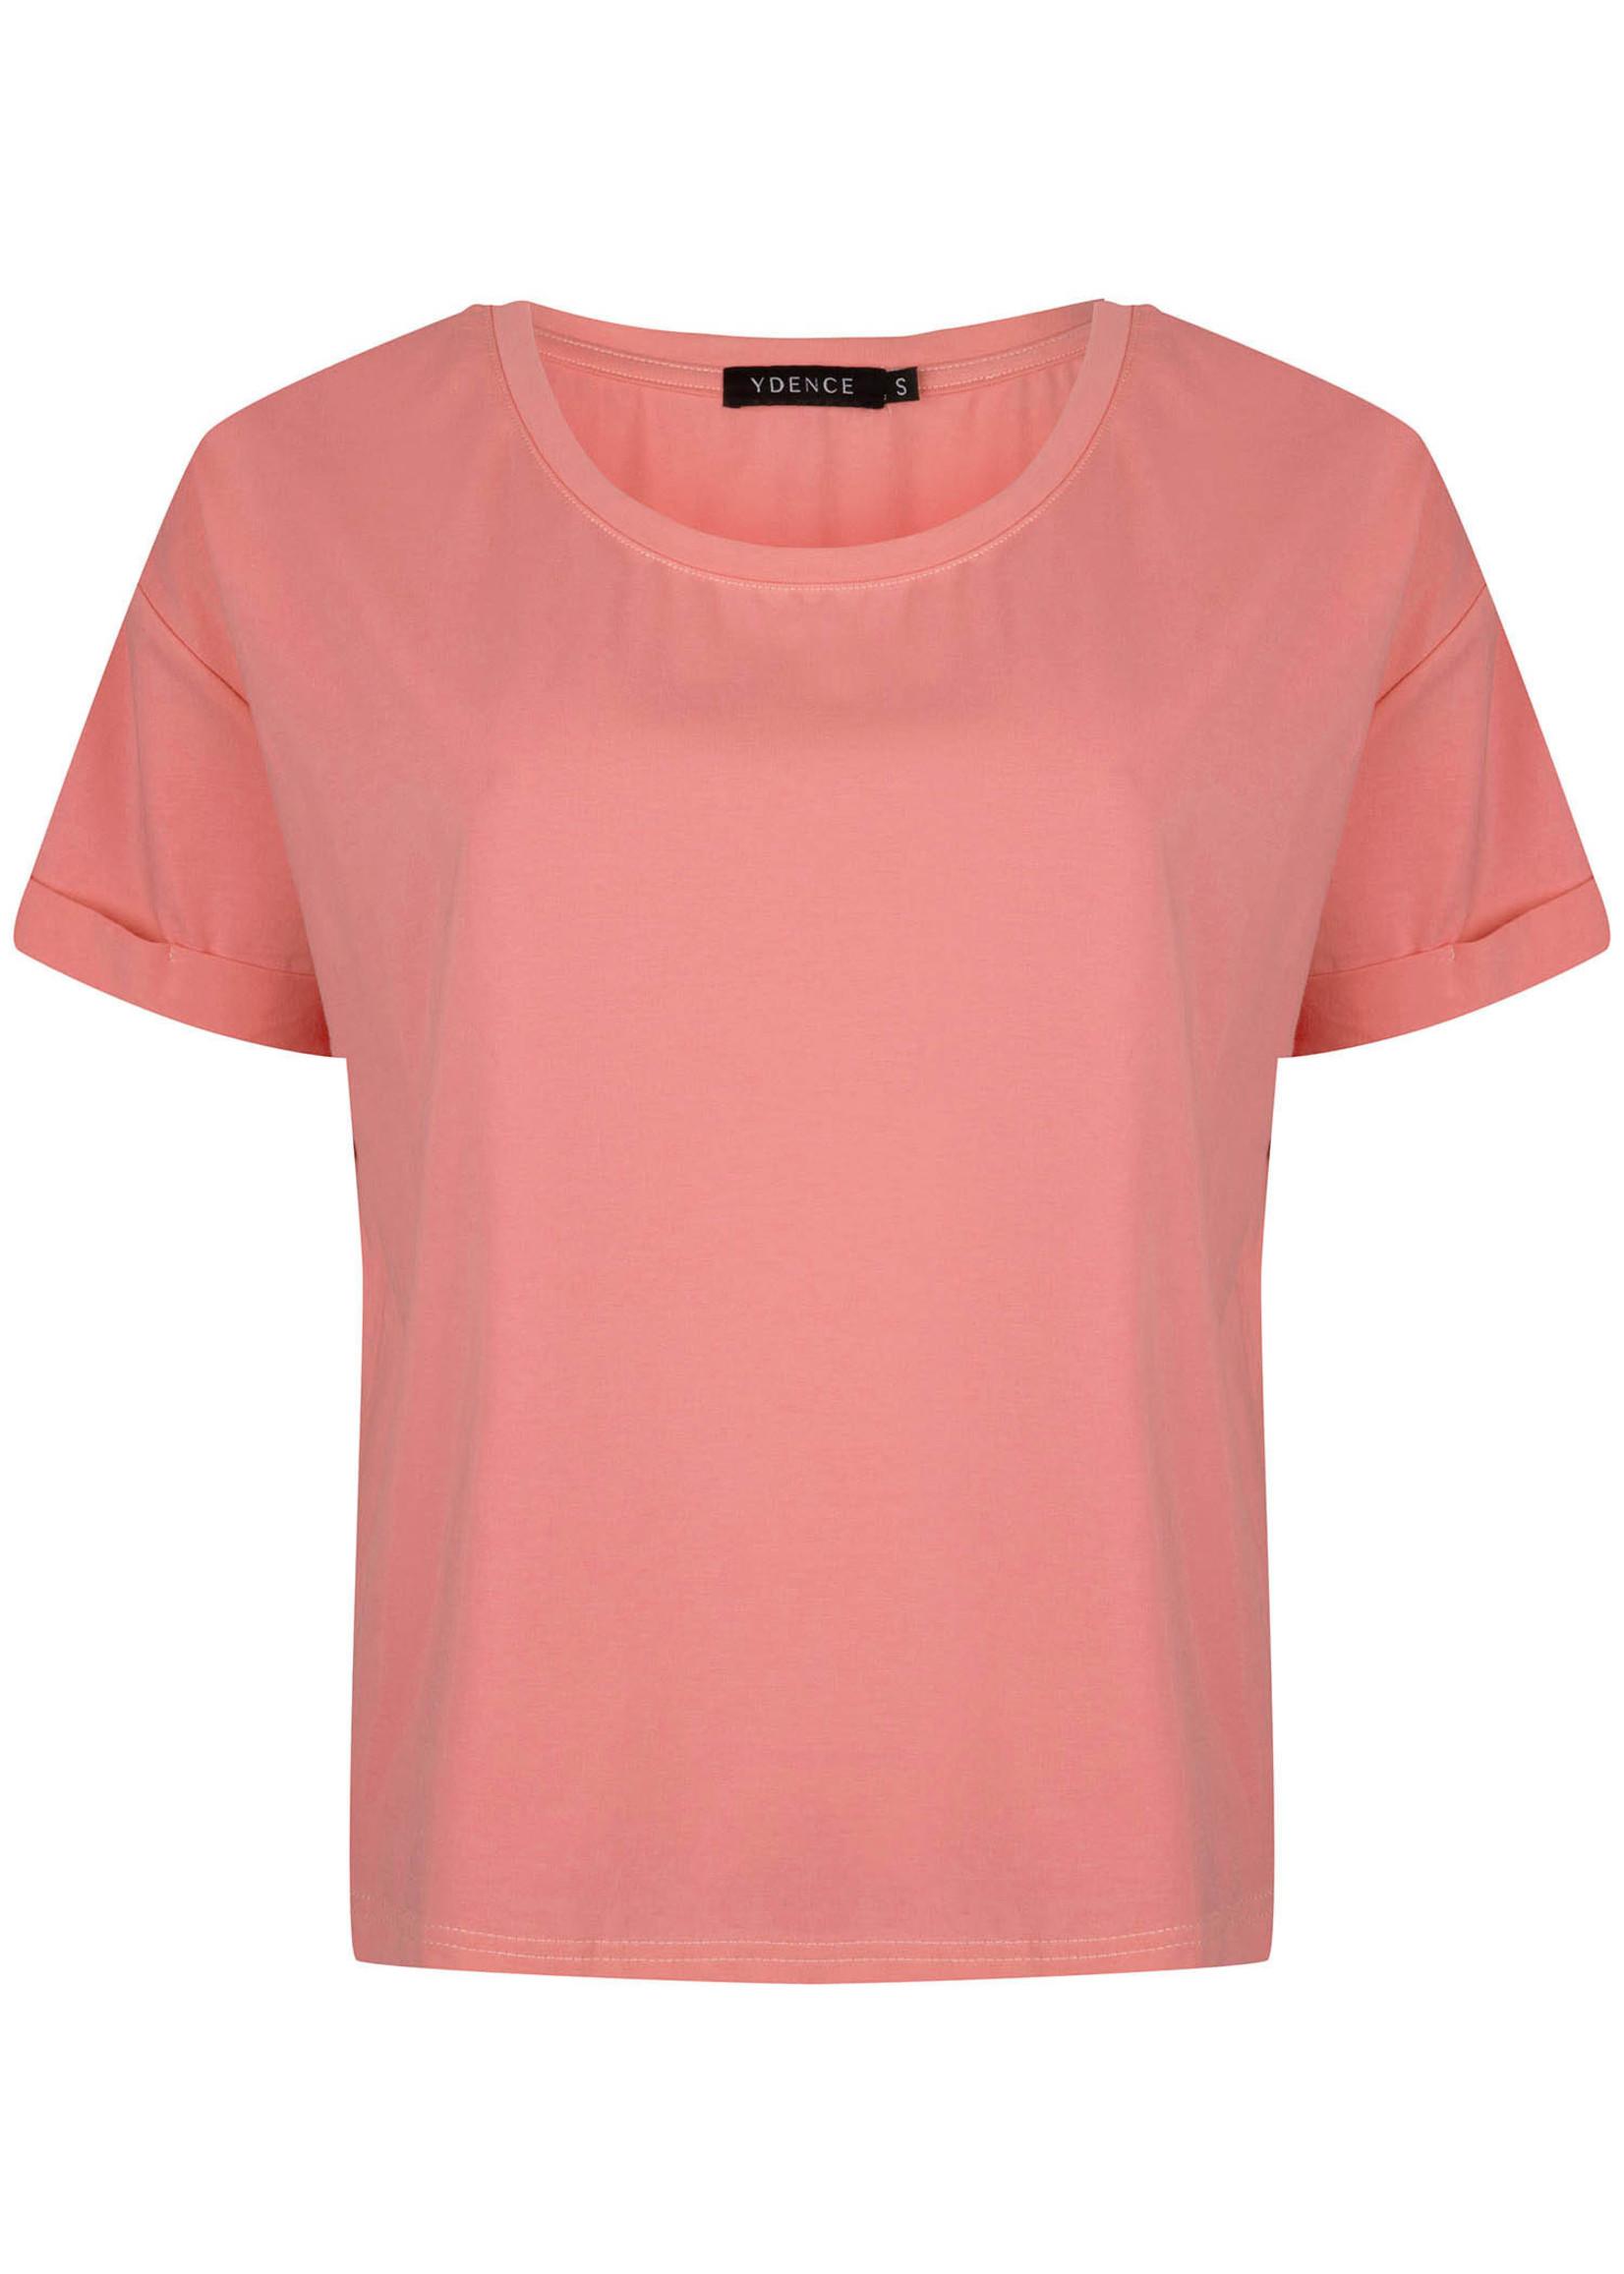 Ydence Shirt peach